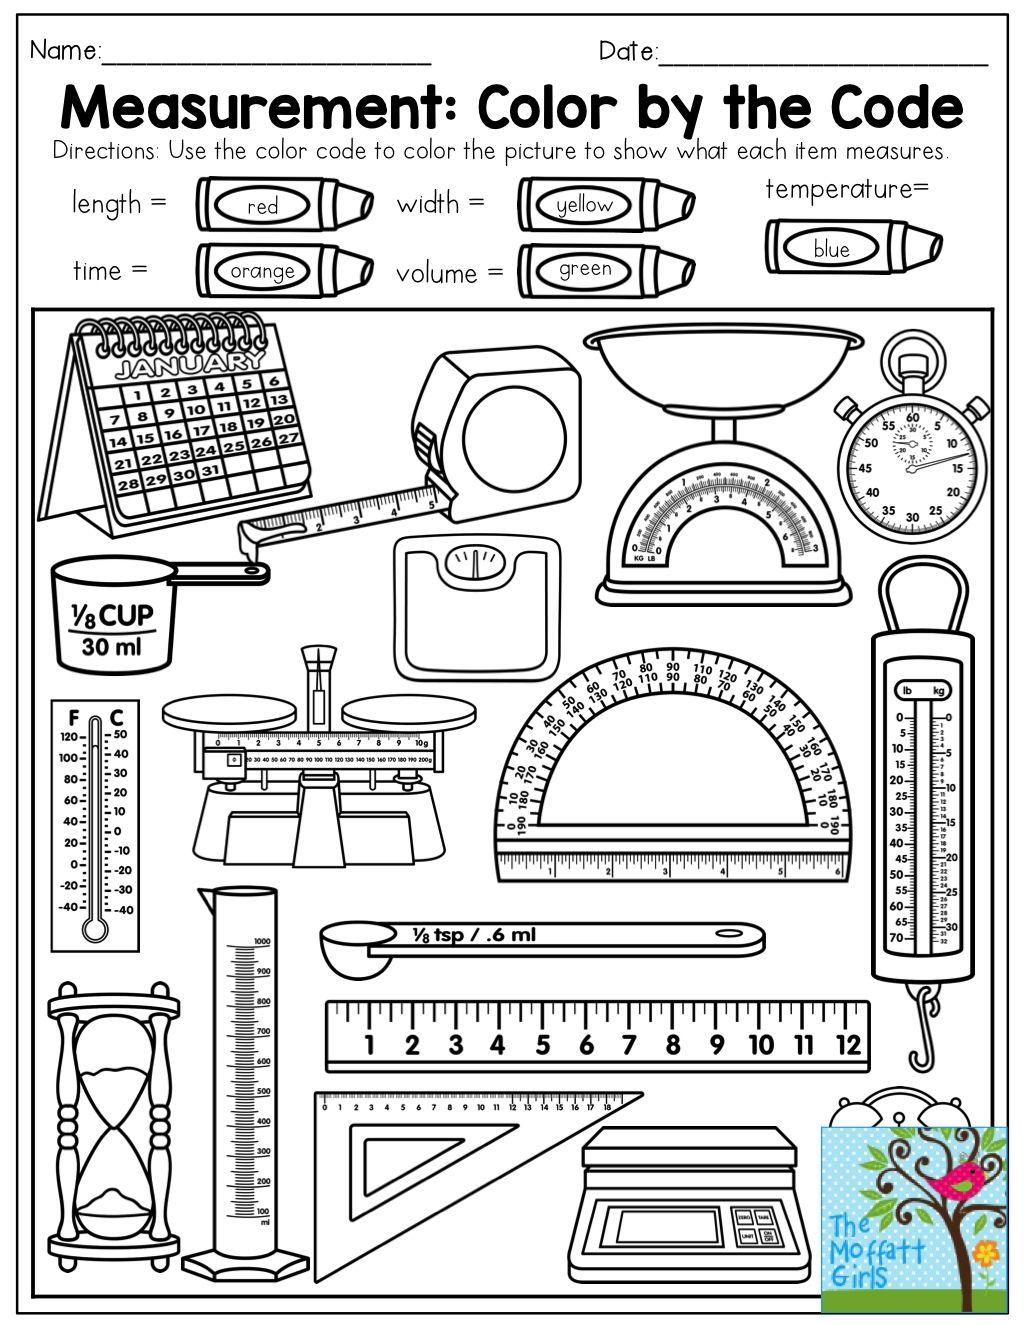 1st Grade Measurement Worksheets To Download Free Math Worksheet For Kids In 2020 1st Grade Math Worksheets Measurement Worksheets Kids Math Worksheets